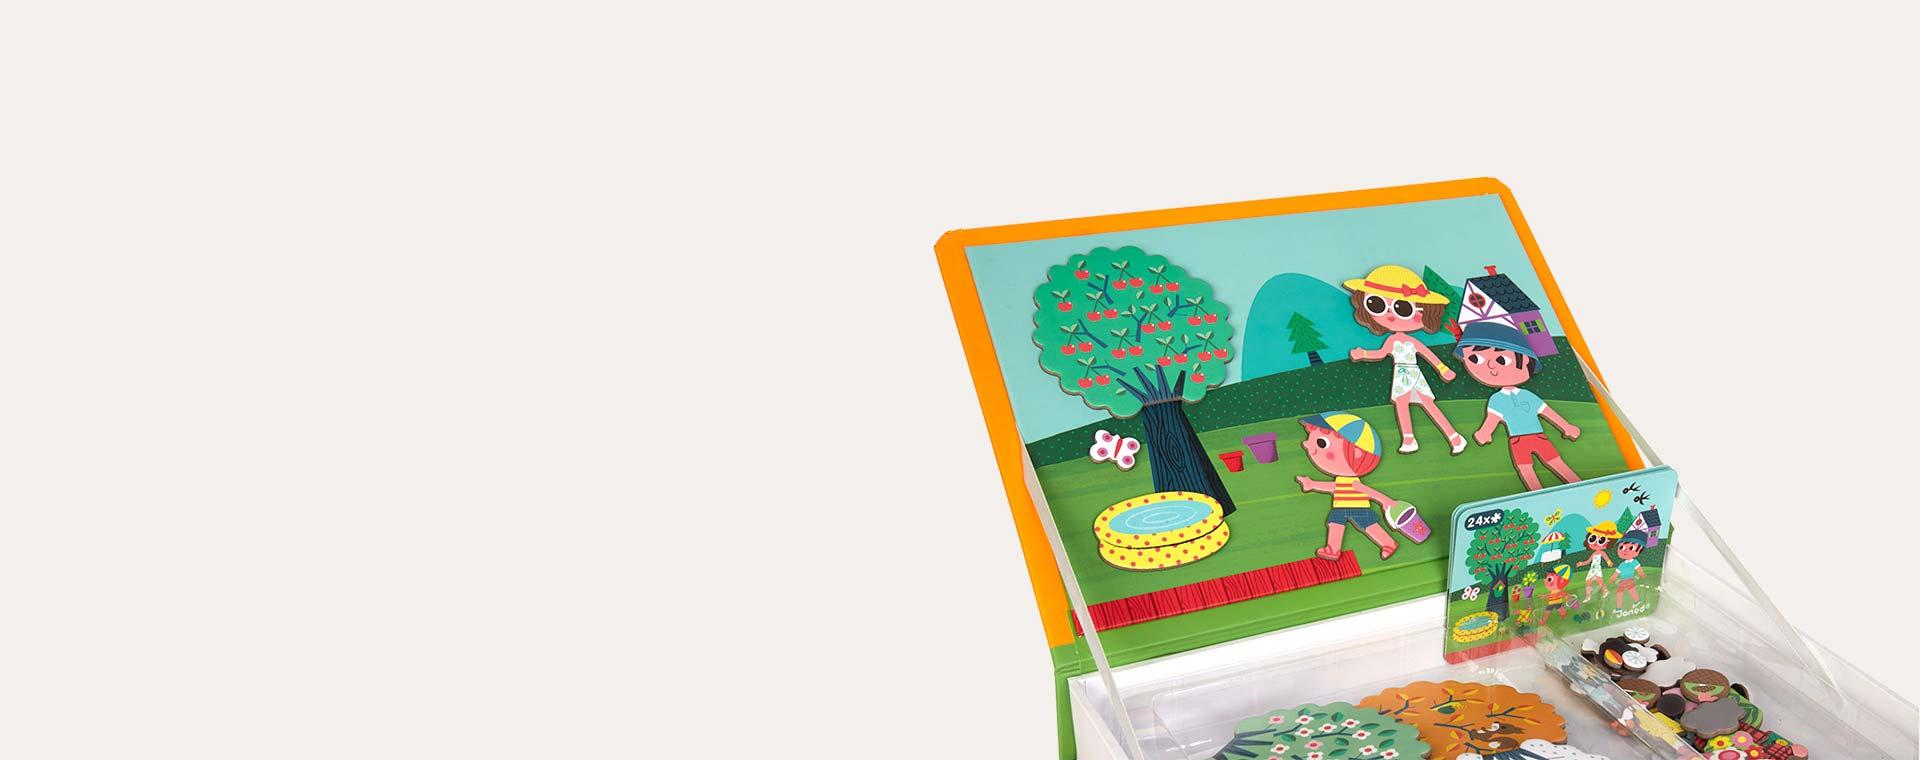 Four Seasons Janod Magnetibook Educational Toy